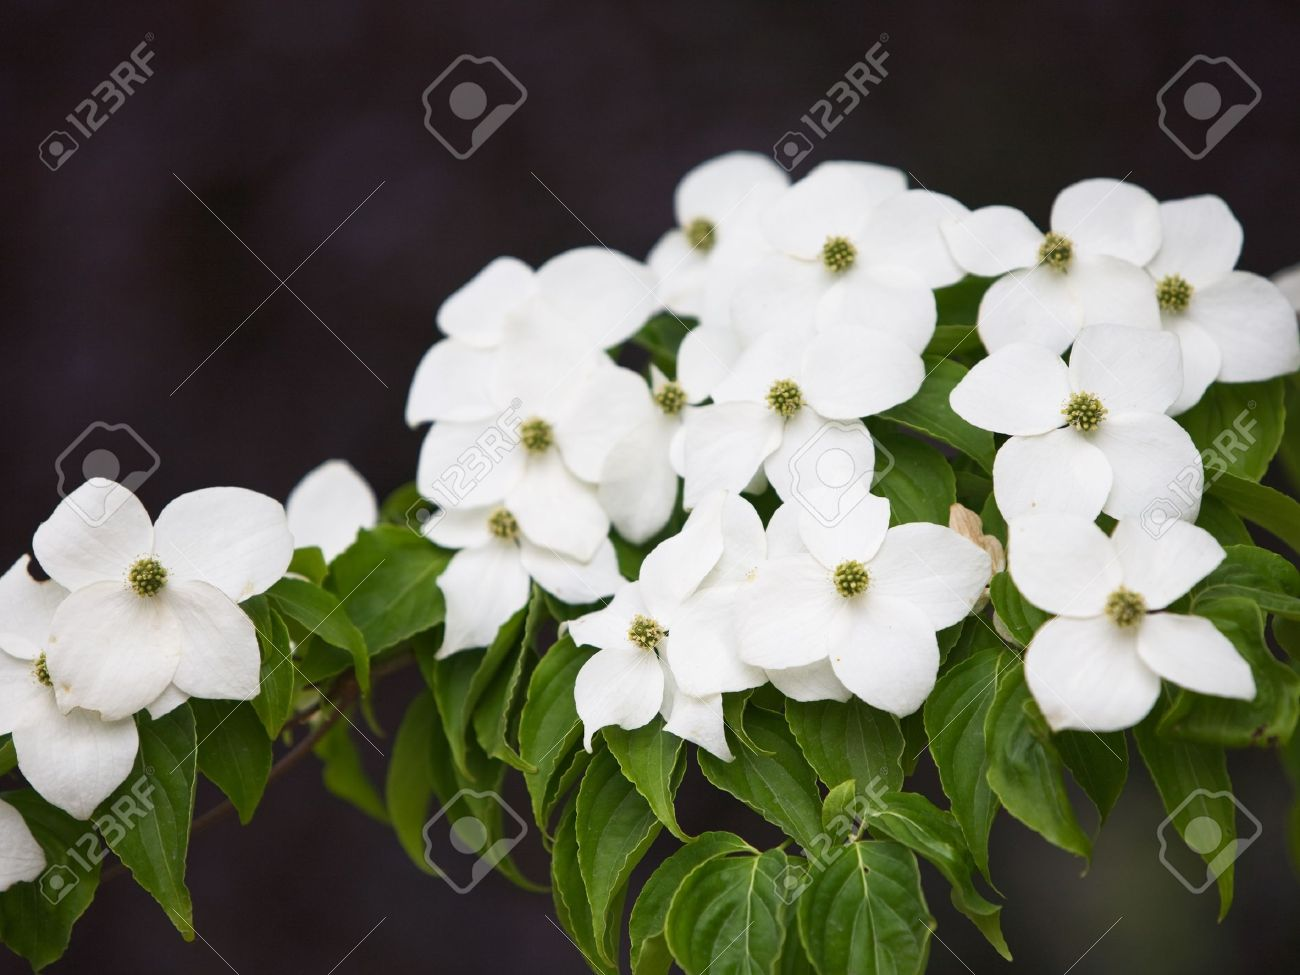 White Kousa Dogwood Flowers Cornus Kousa Japanese Flowering